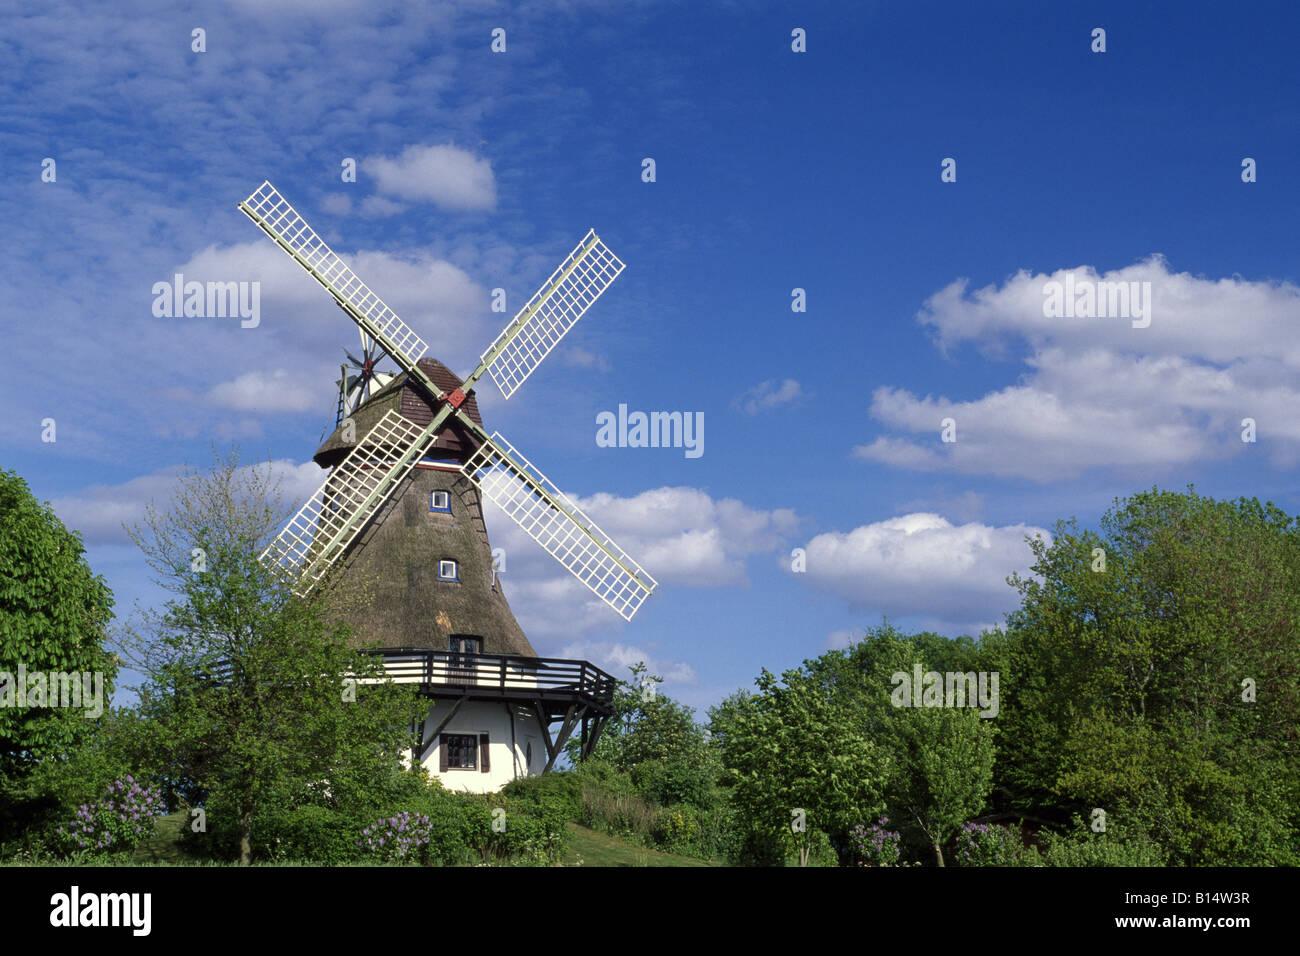 Windmill in Angeln Schlei, Schleswig Holstein, Germany Stock Photo